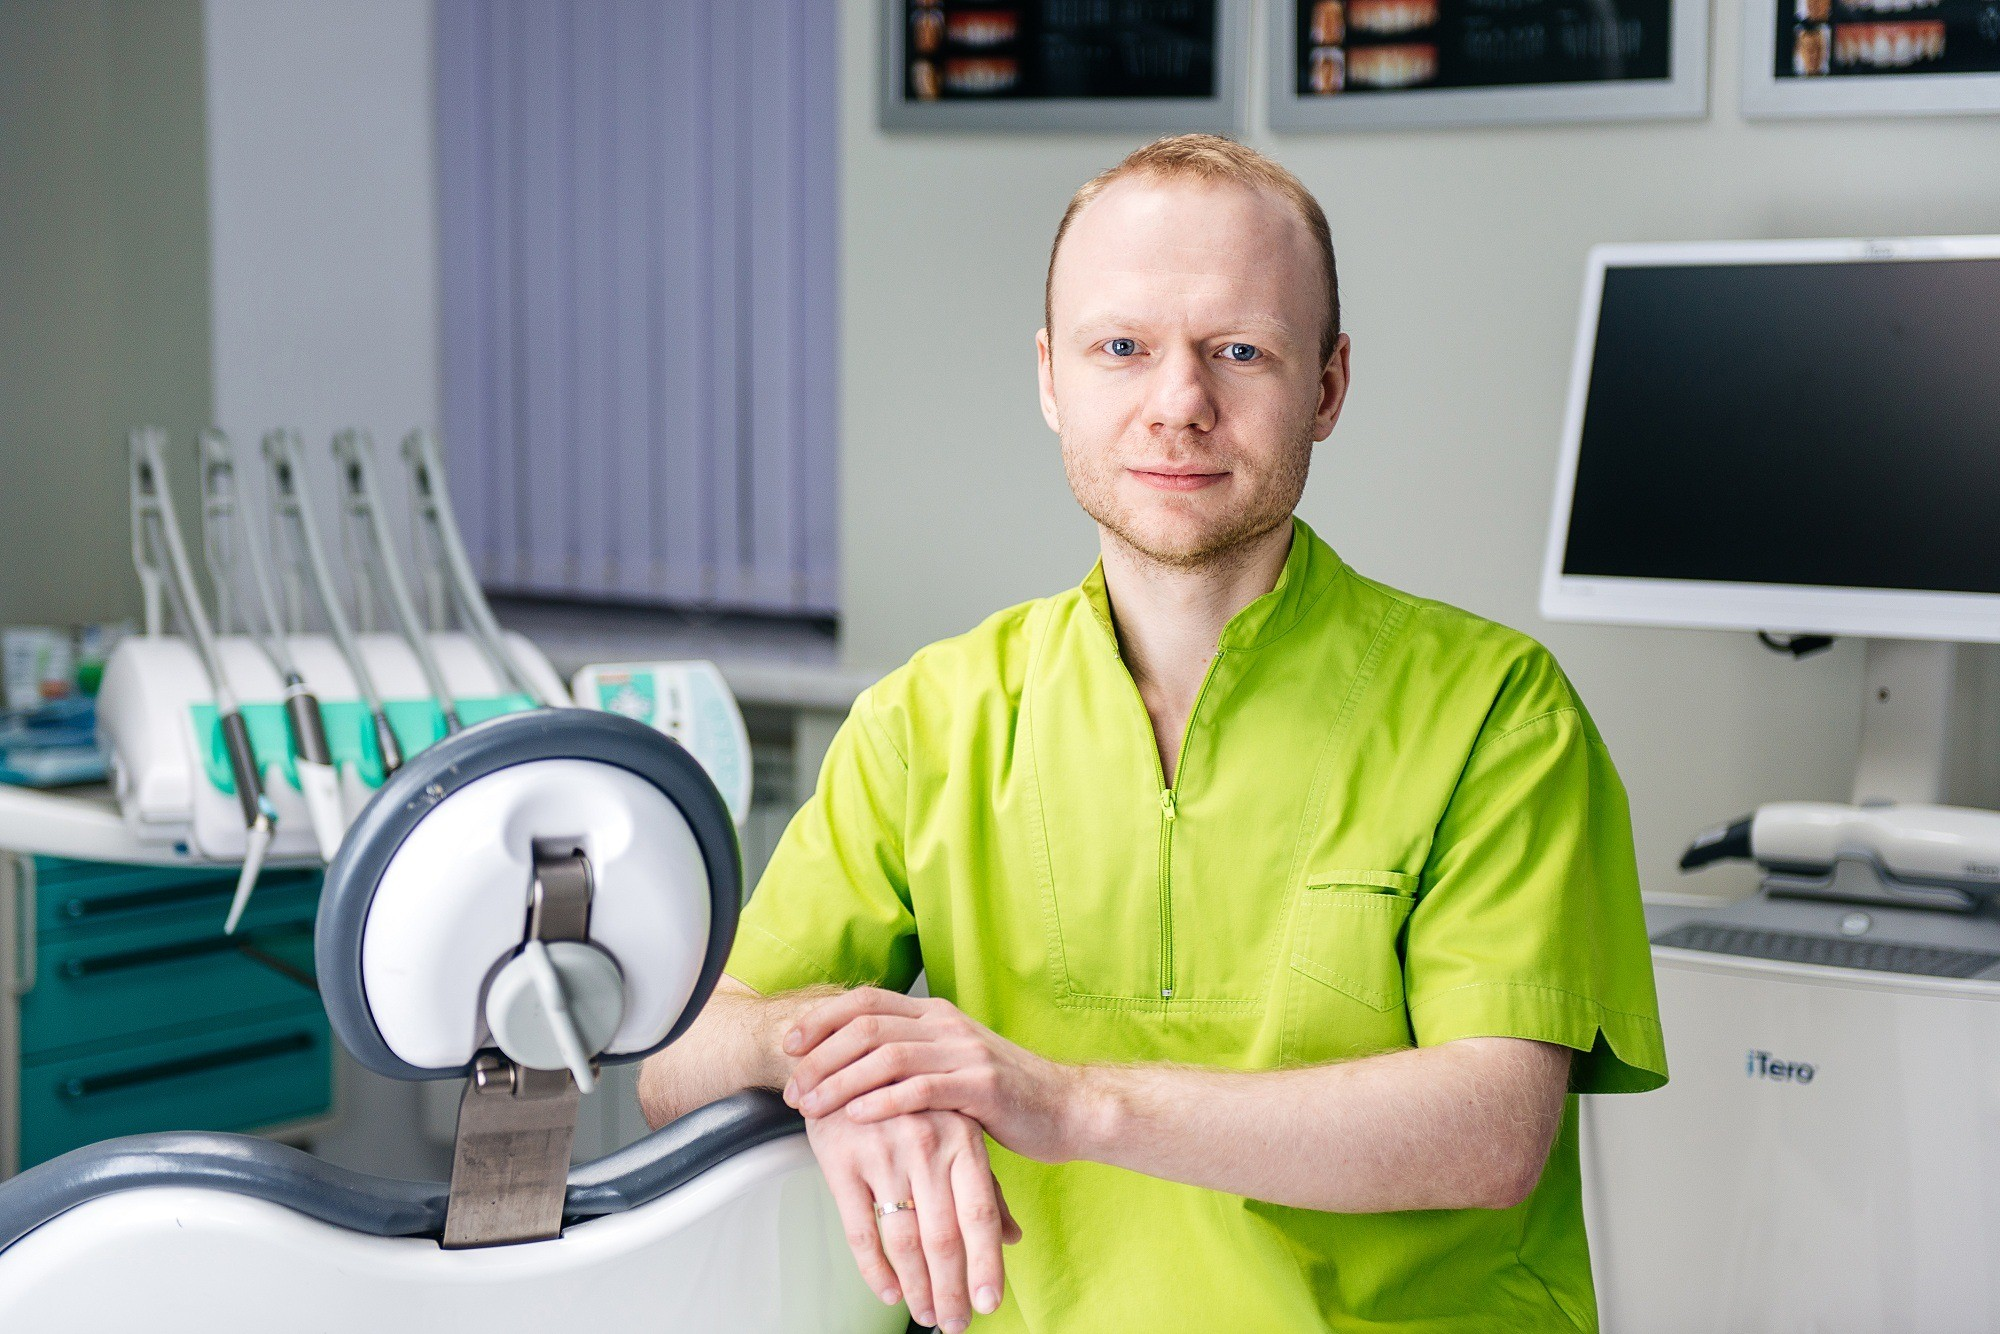 Антон Герасимов, стоматолог, хирург-имплантолог, кандидат медицинских наук